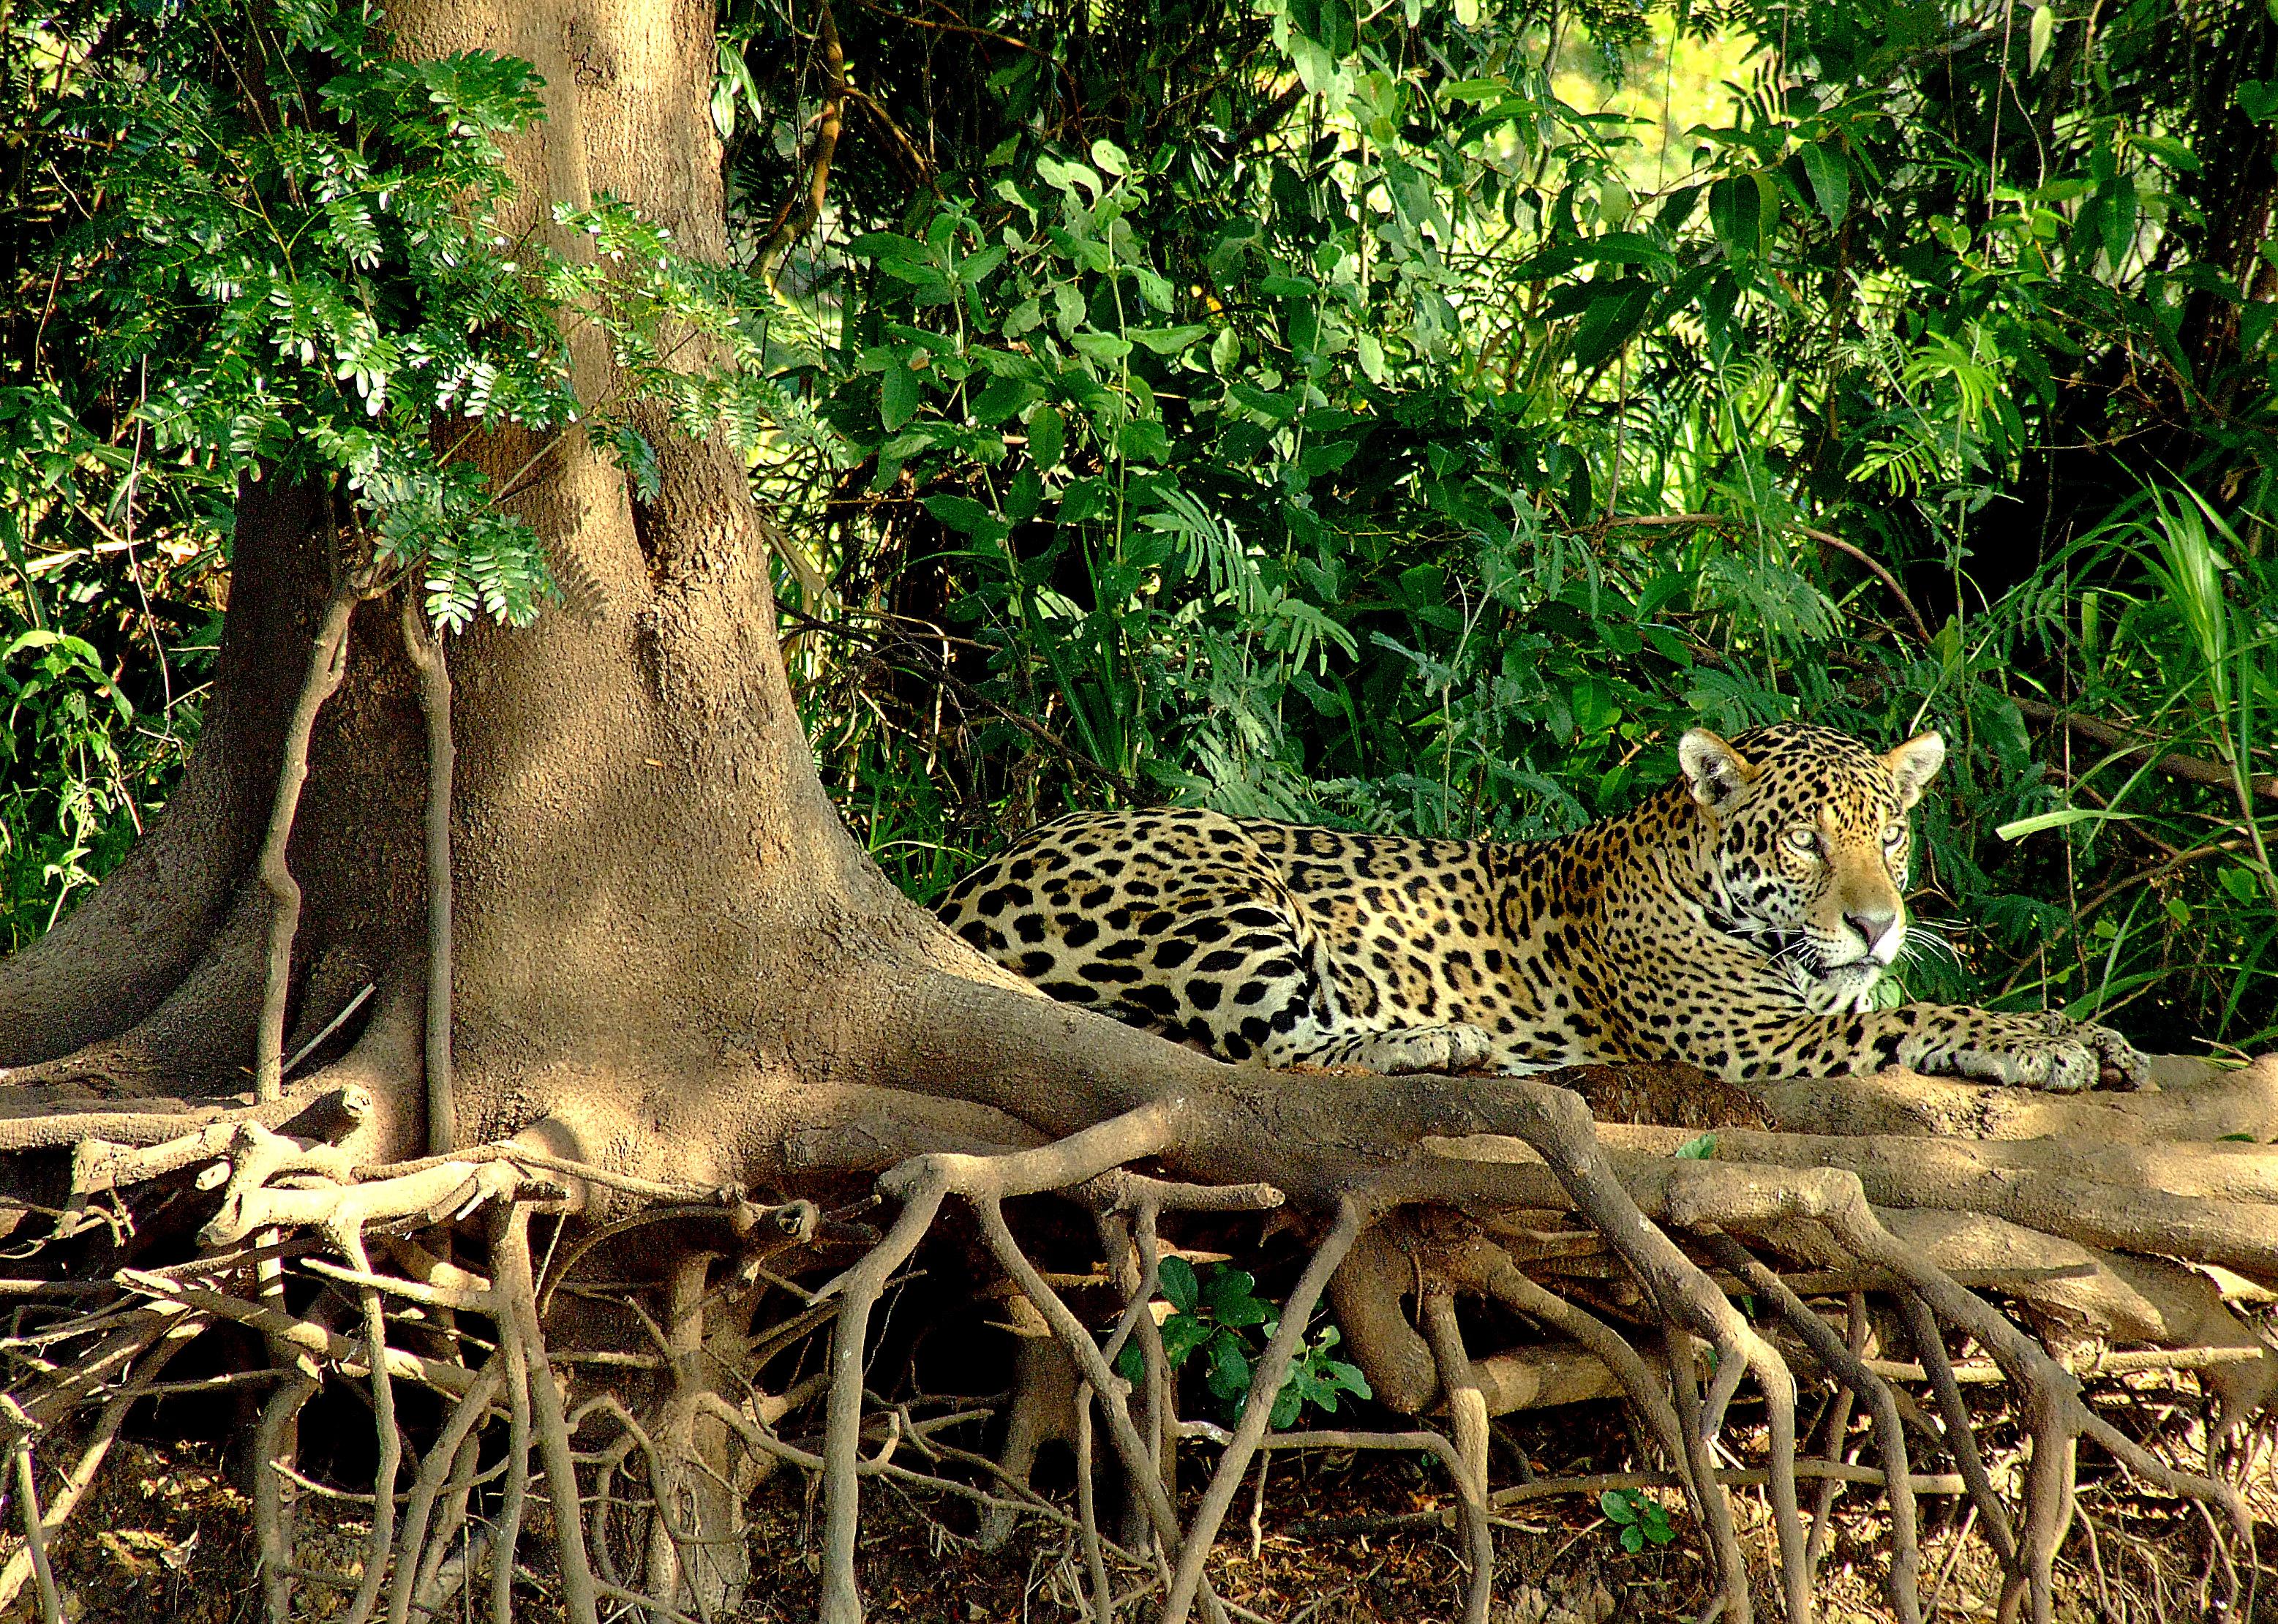 pantanal jaguar safaris wildlife birding jaguar tours brazil photo by mario friedlander. Black Bedroom Furniture Sets. Home Design Ideas